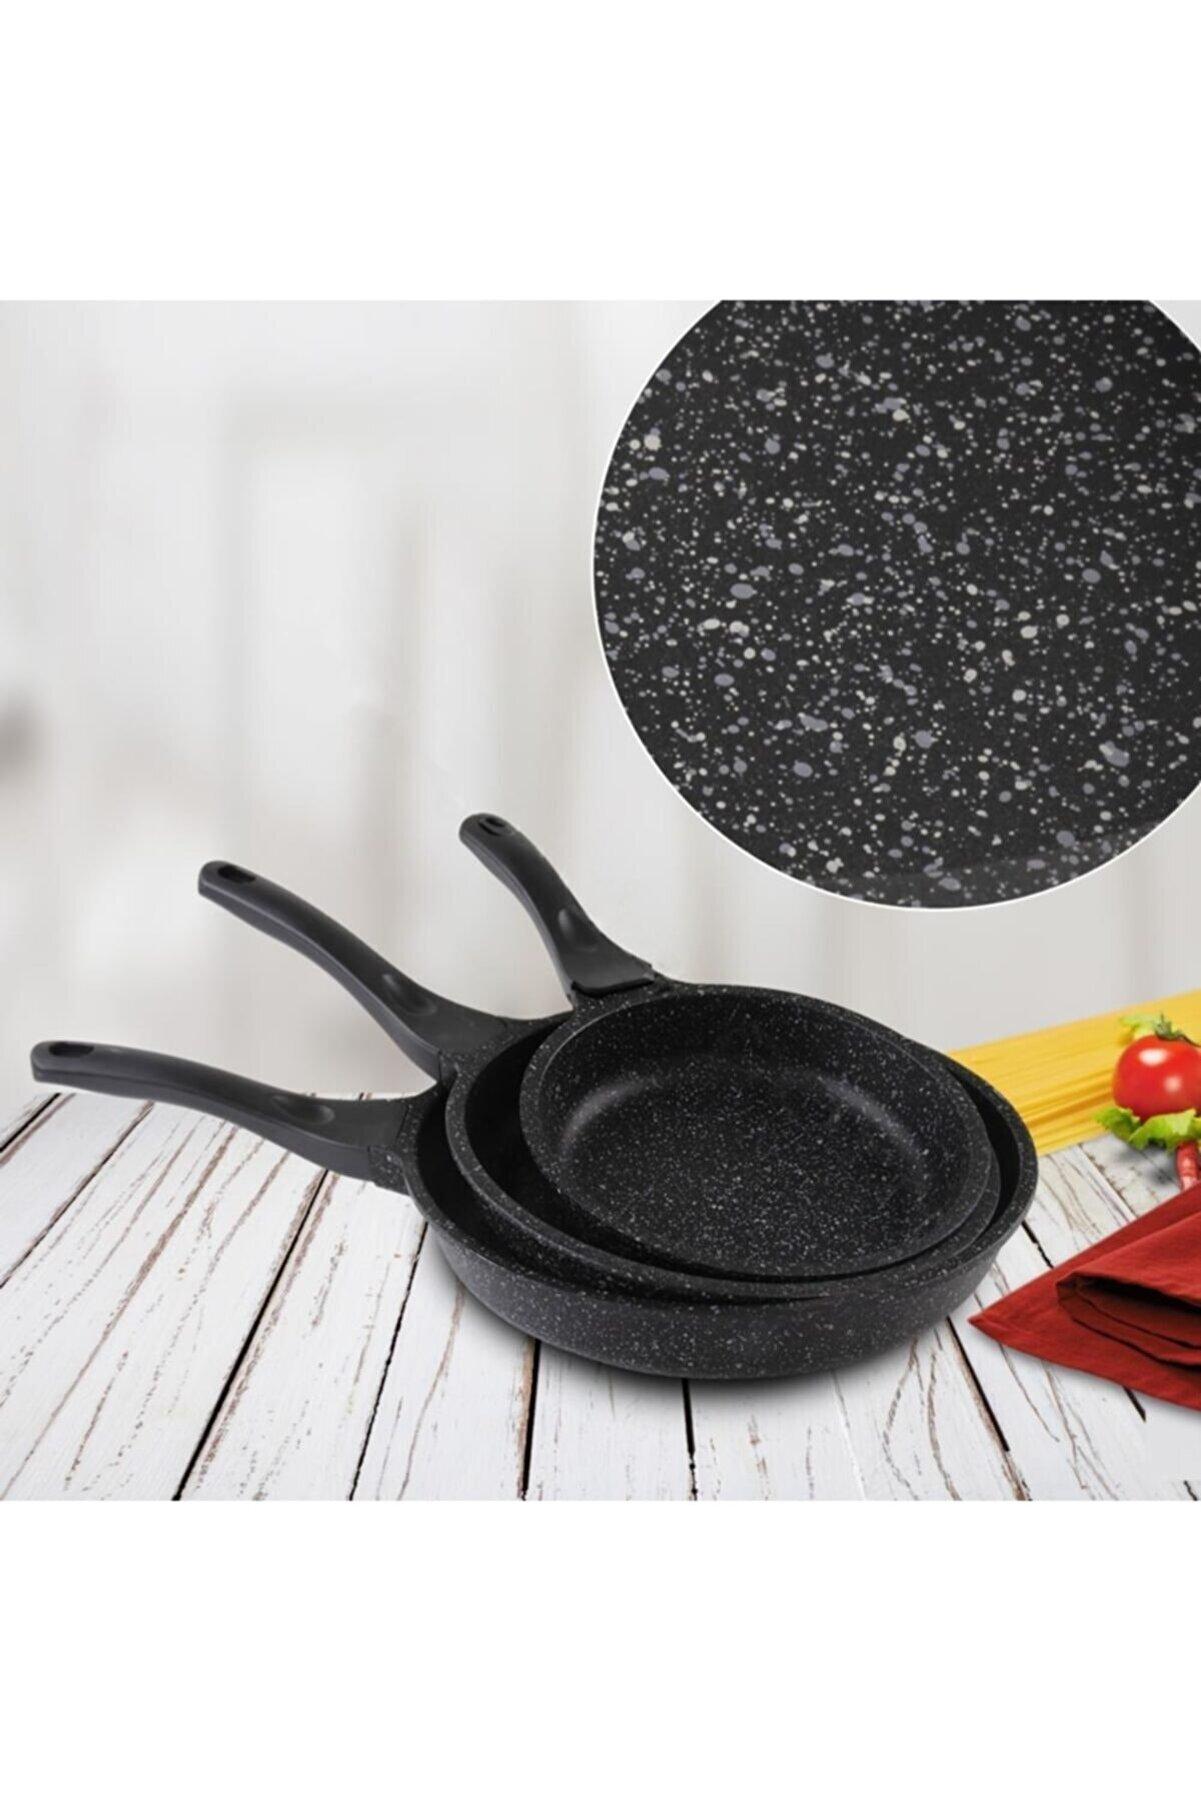 Falez Pan 3lu Döküm Tava Black